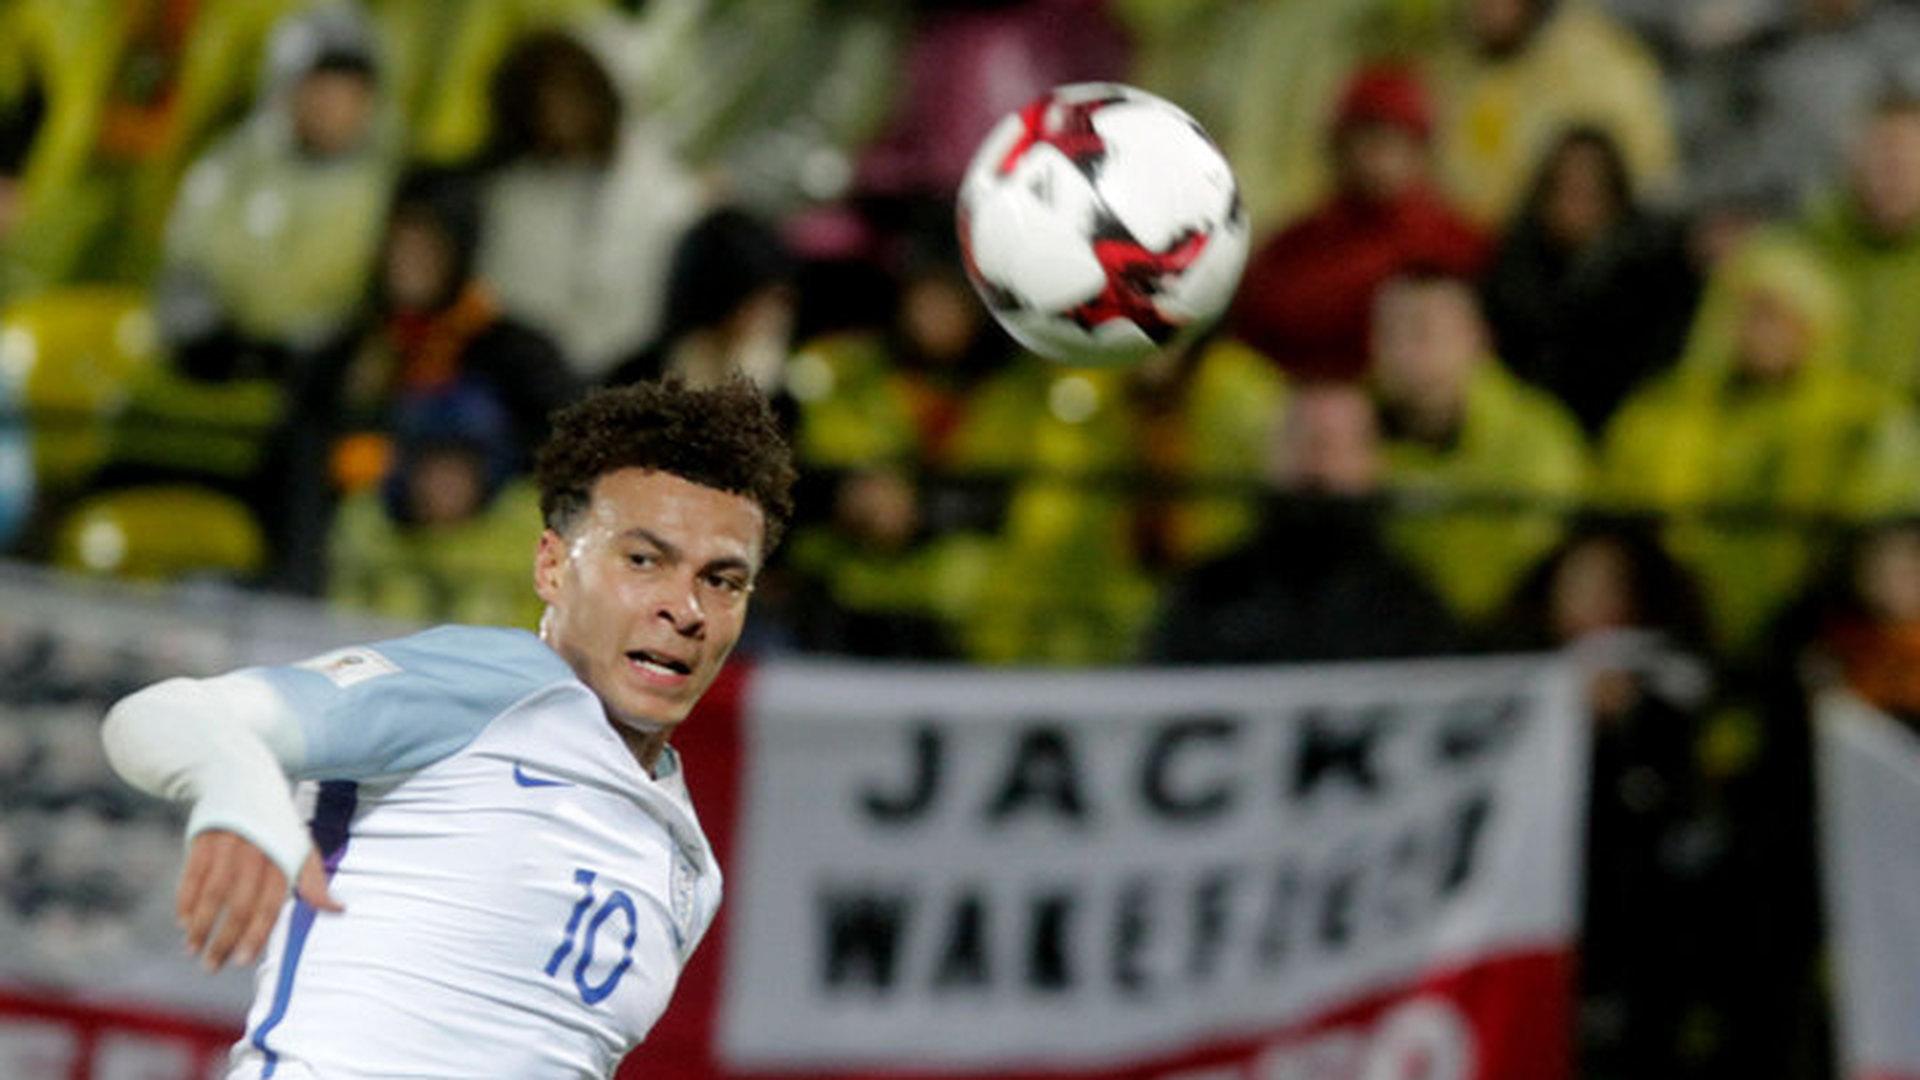 Футболист Англии Алли пропустит матч против Панамы